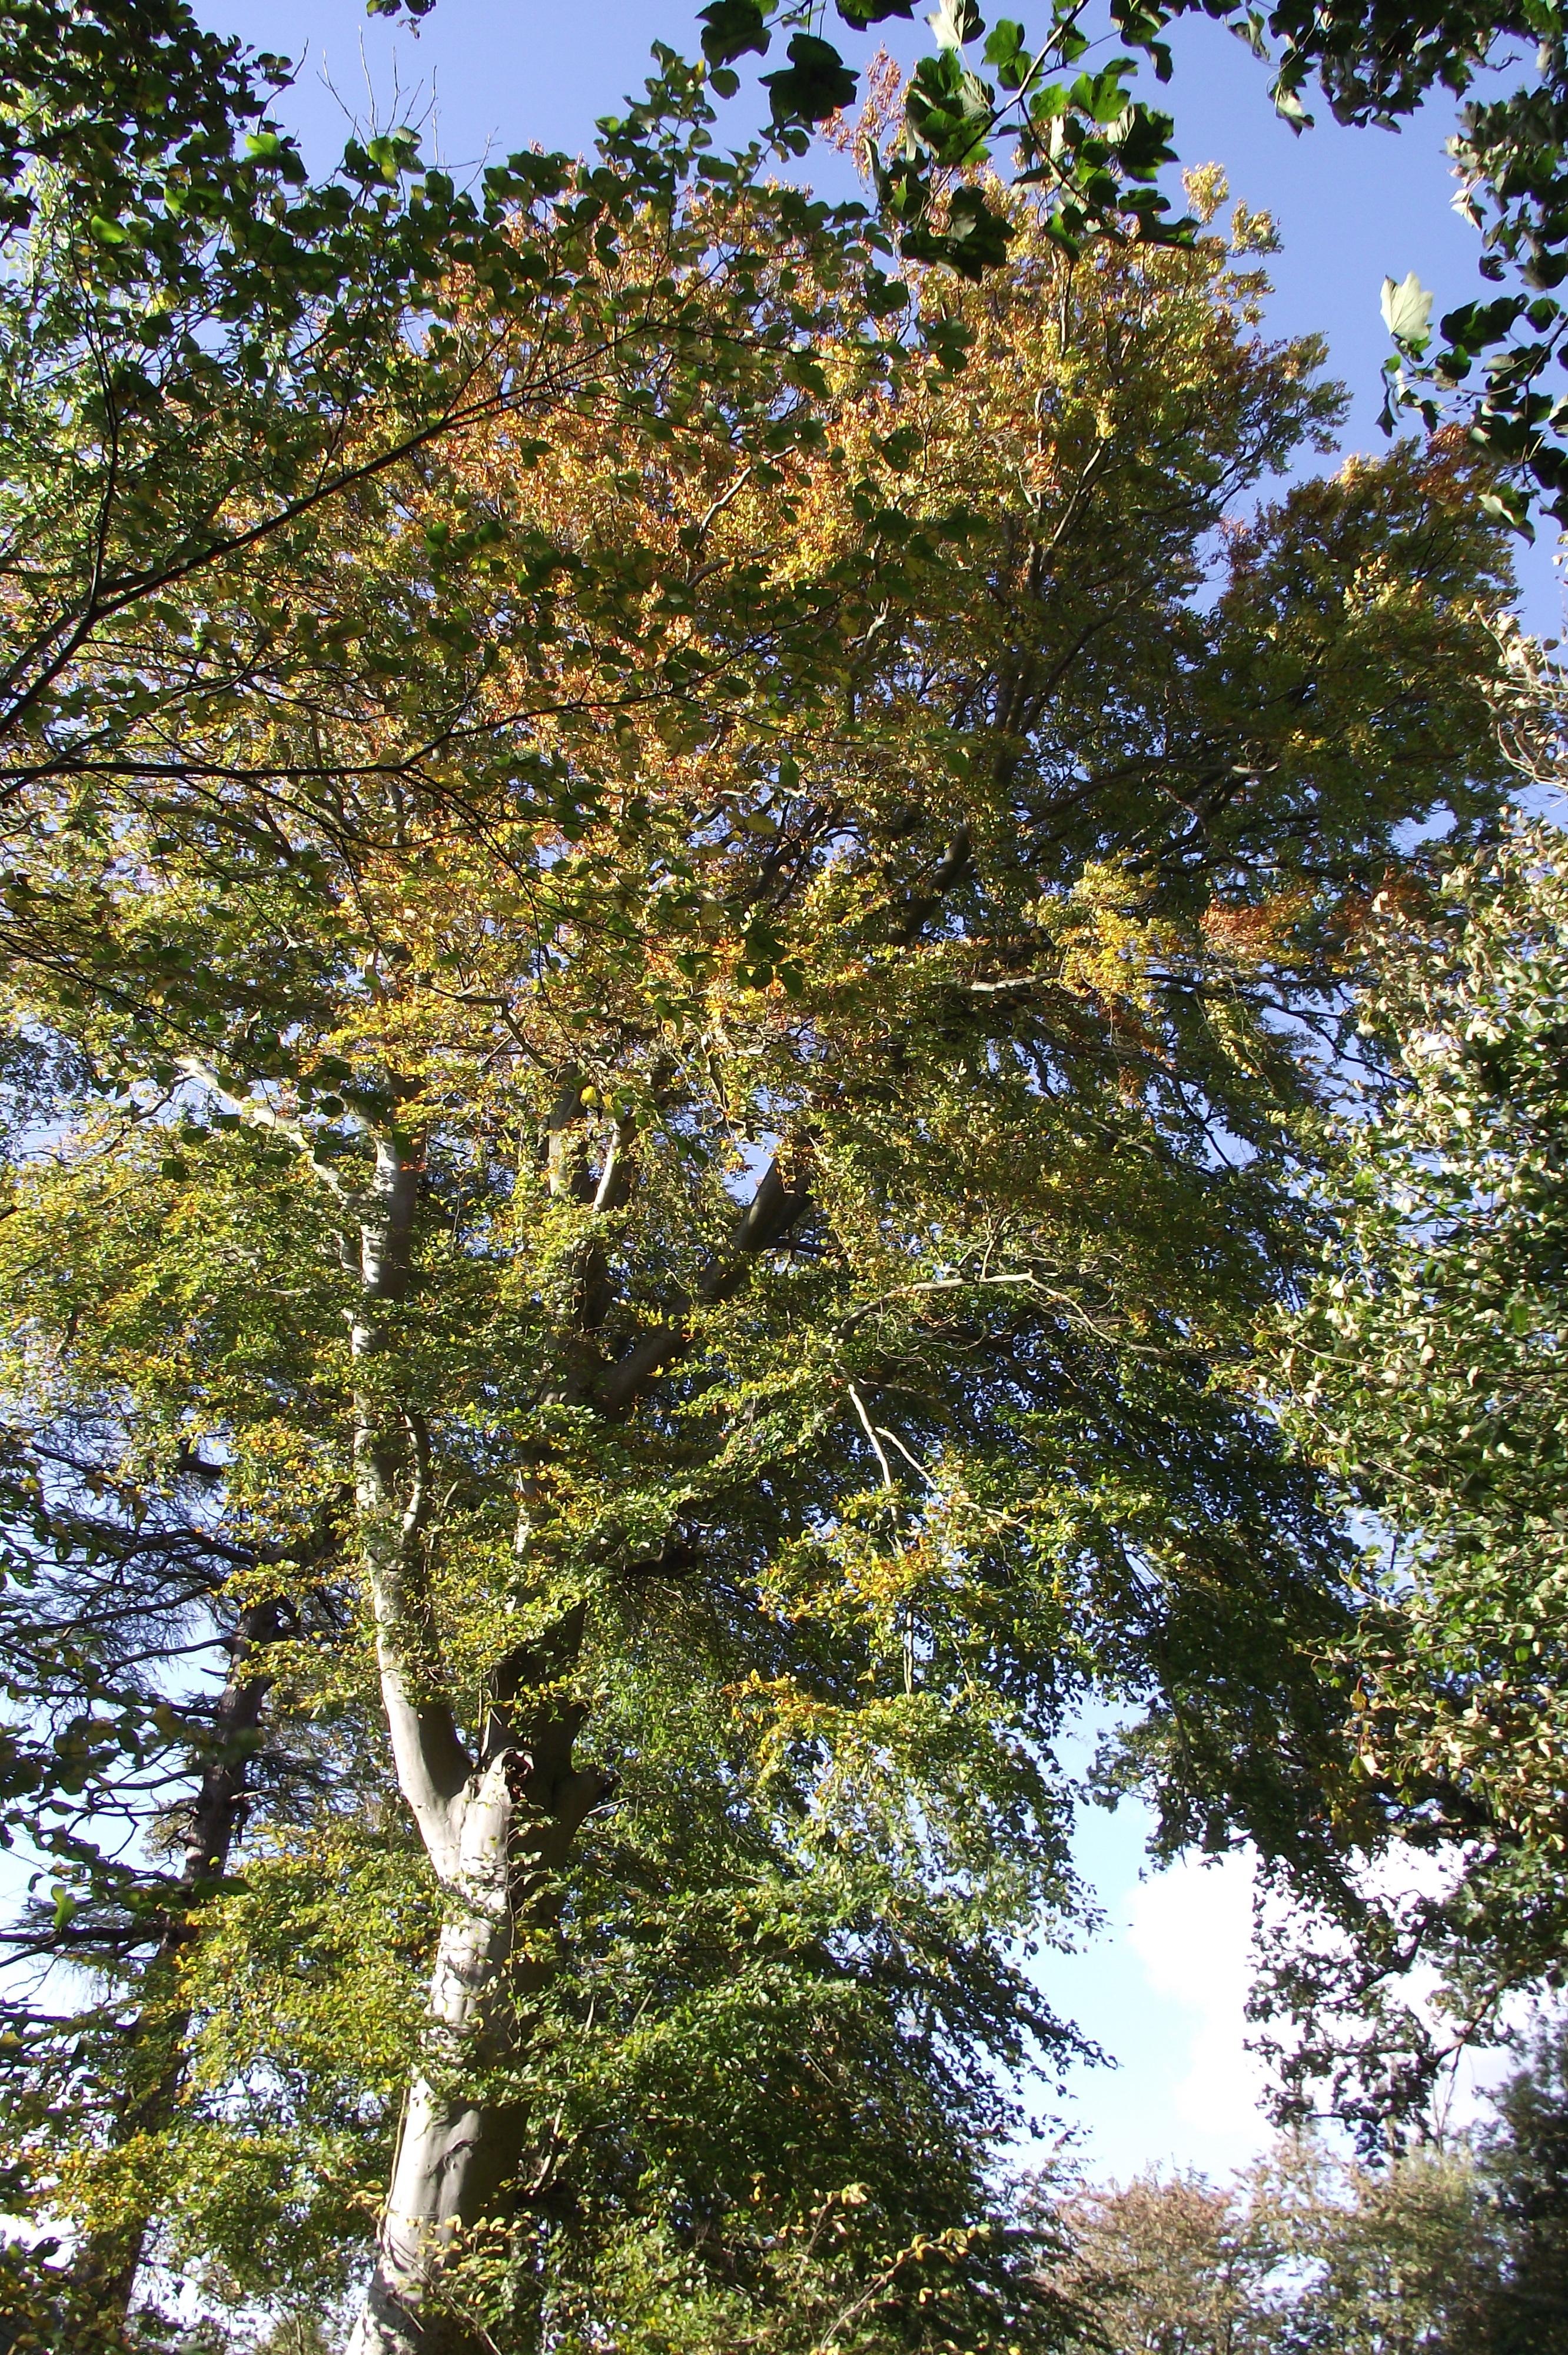 tree in October